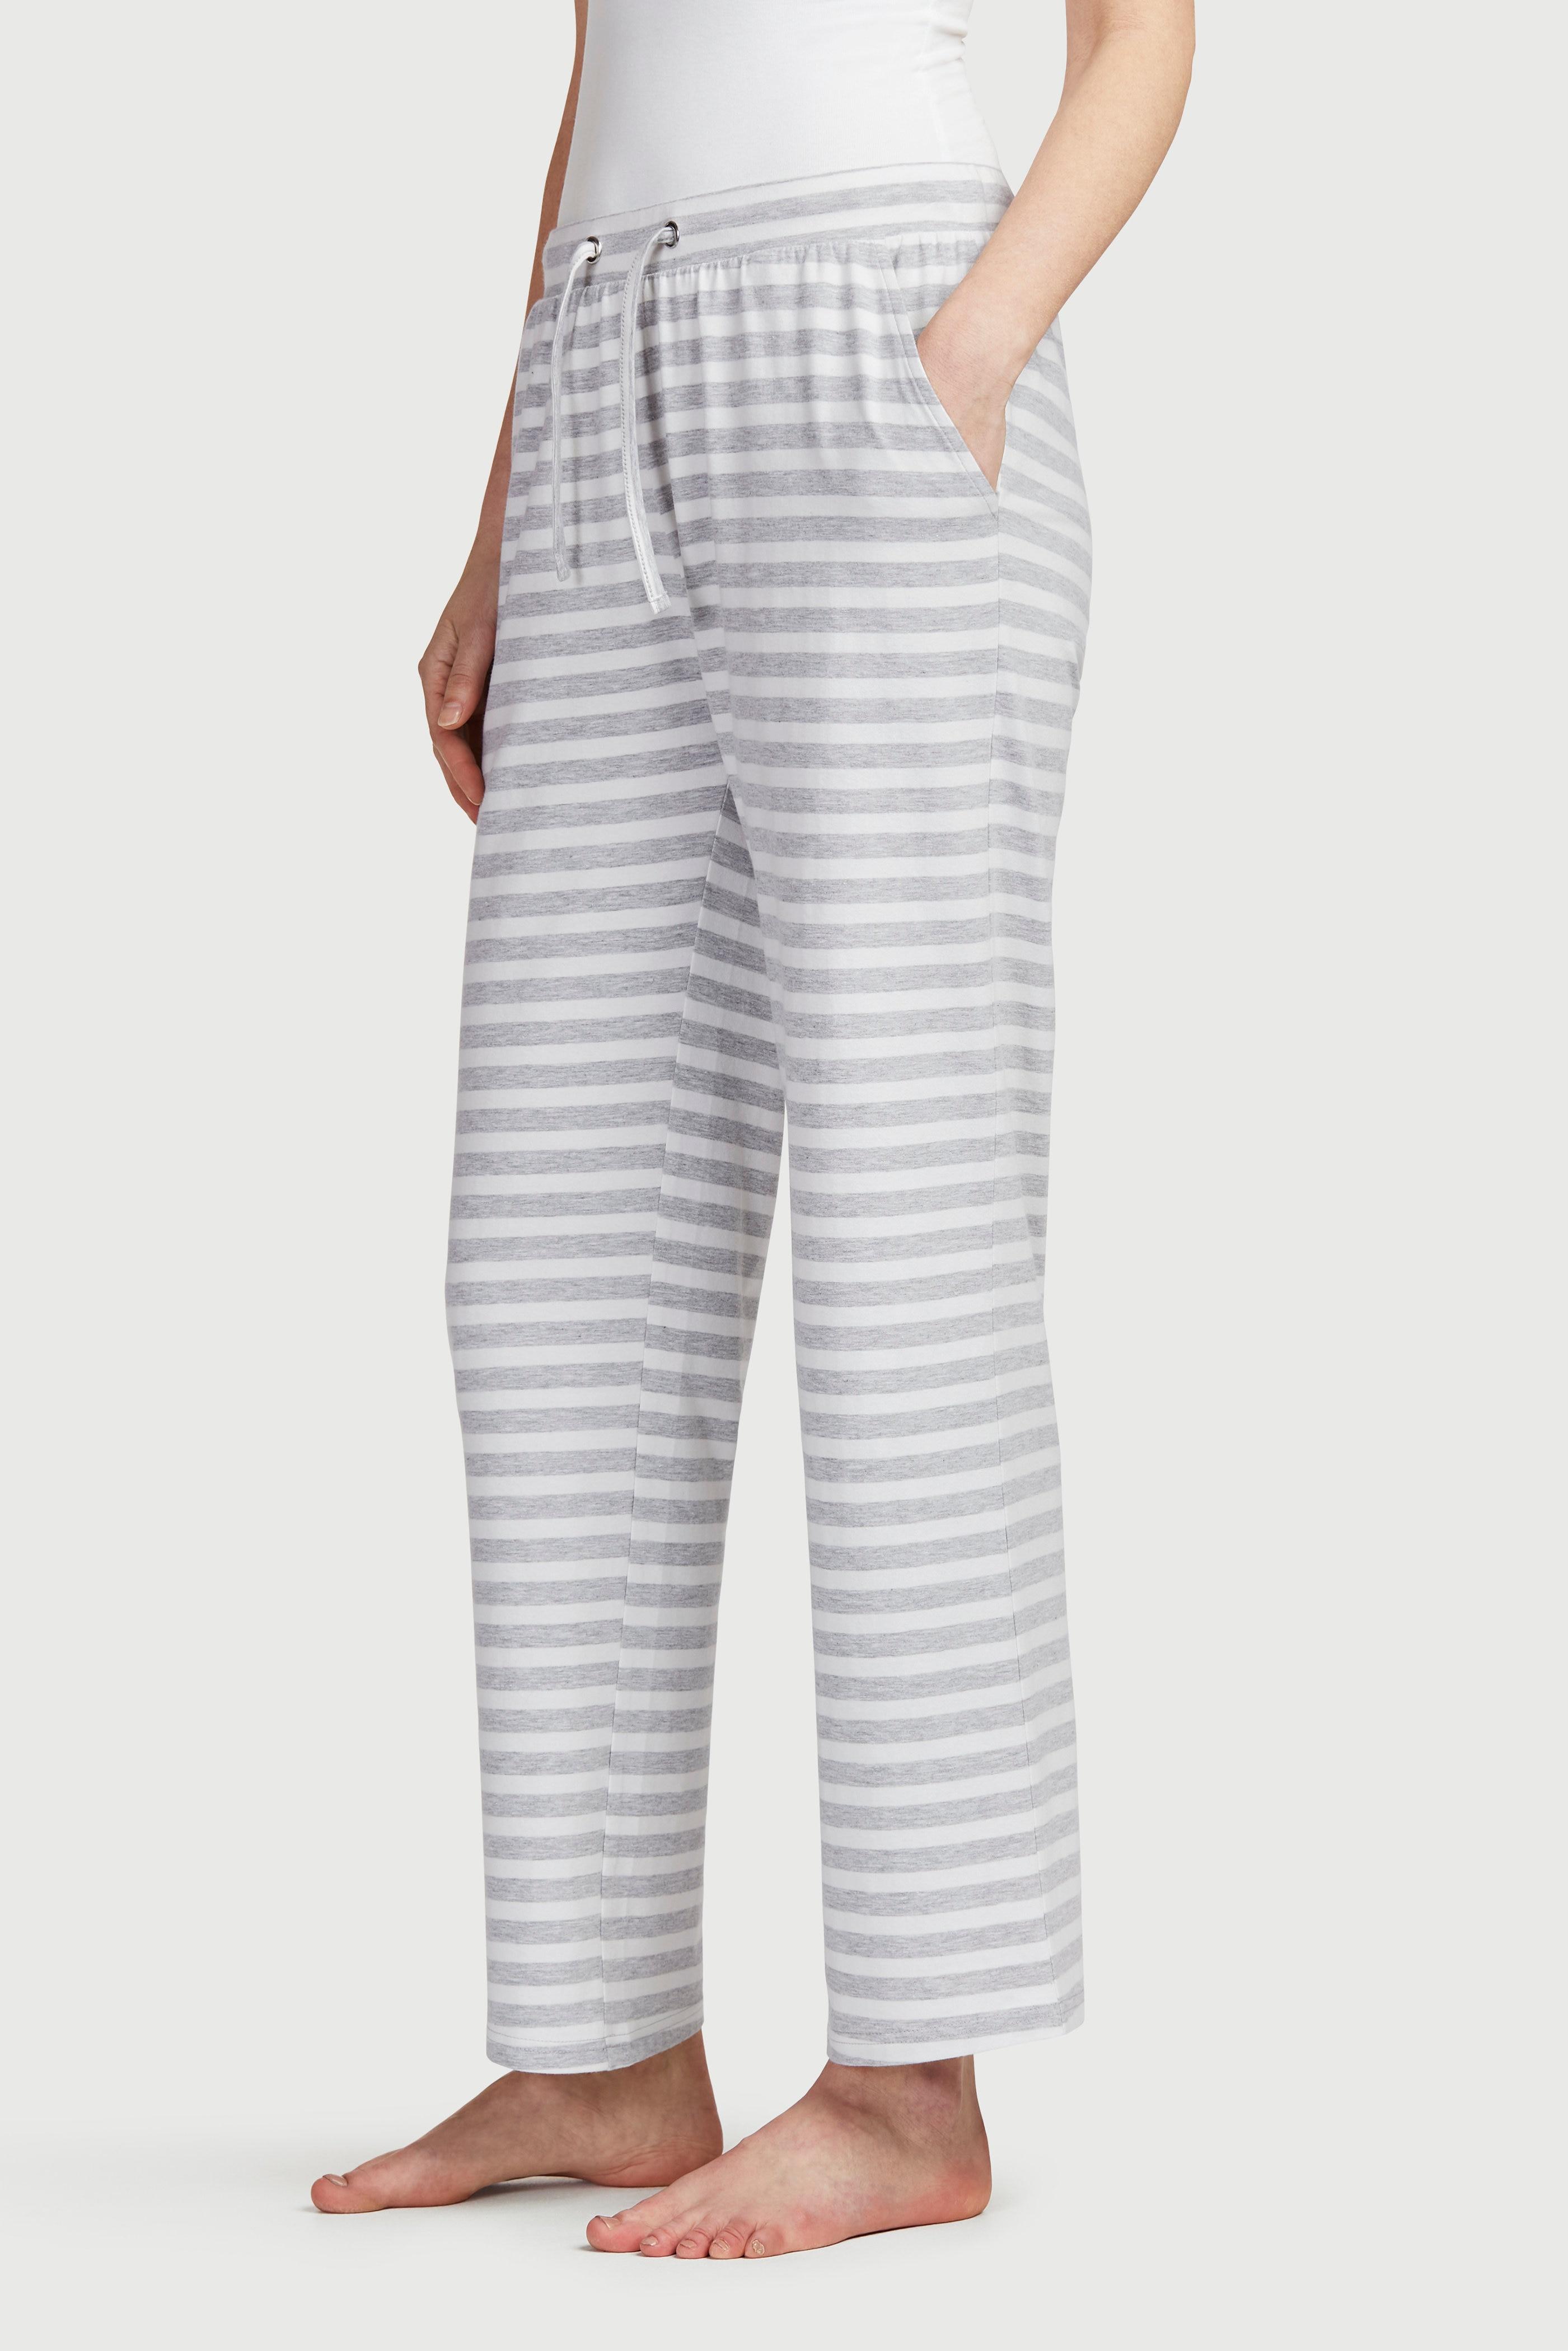 Pidžamas bikses